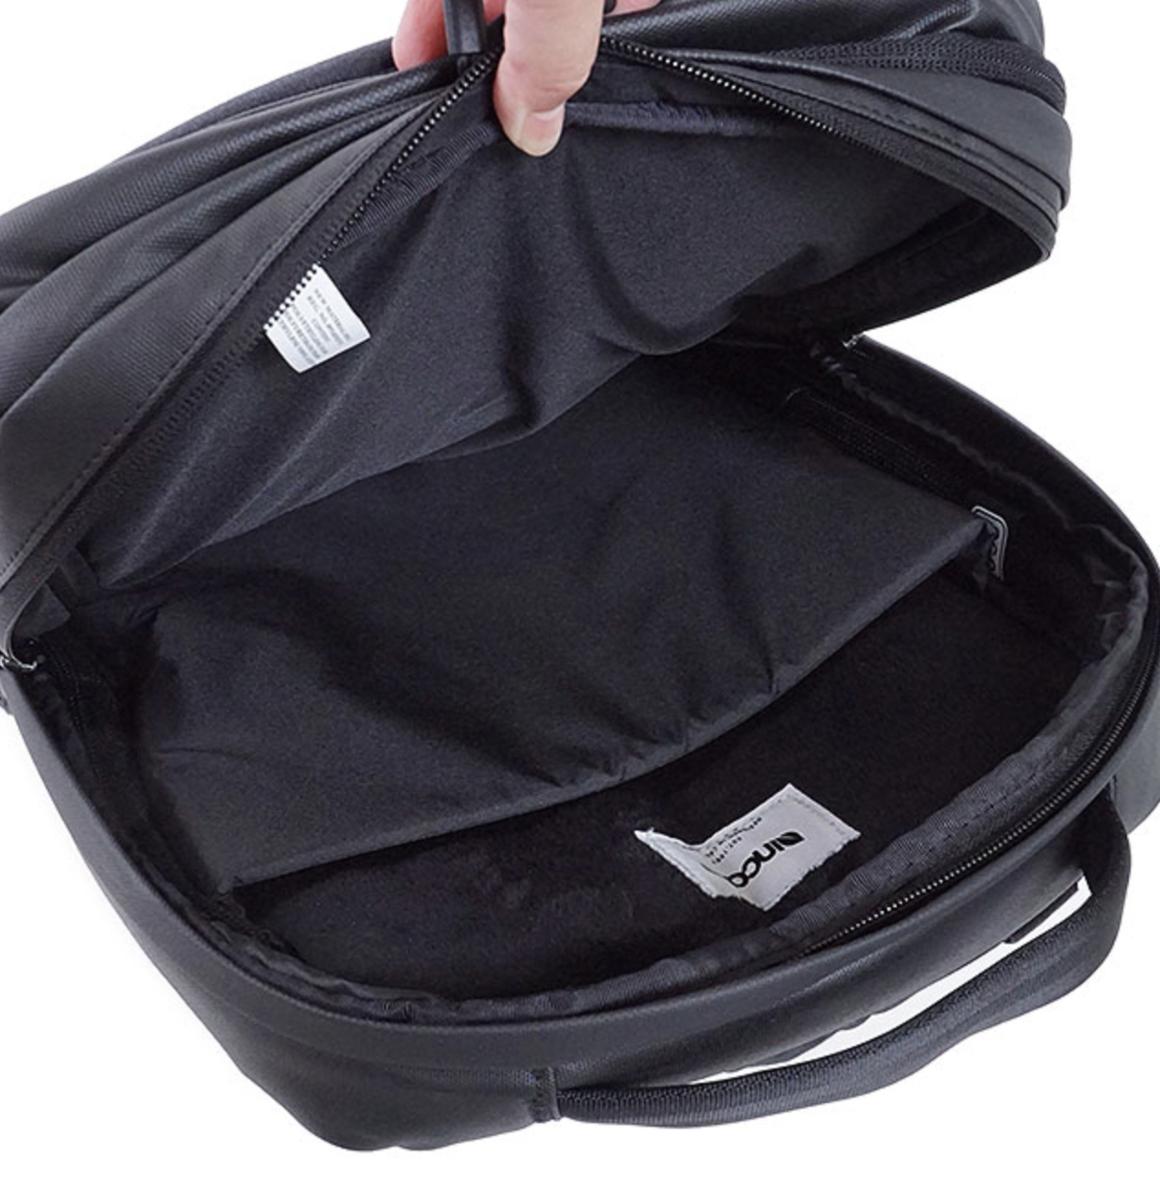 f:id:thebackpack:20190822182519p:plain